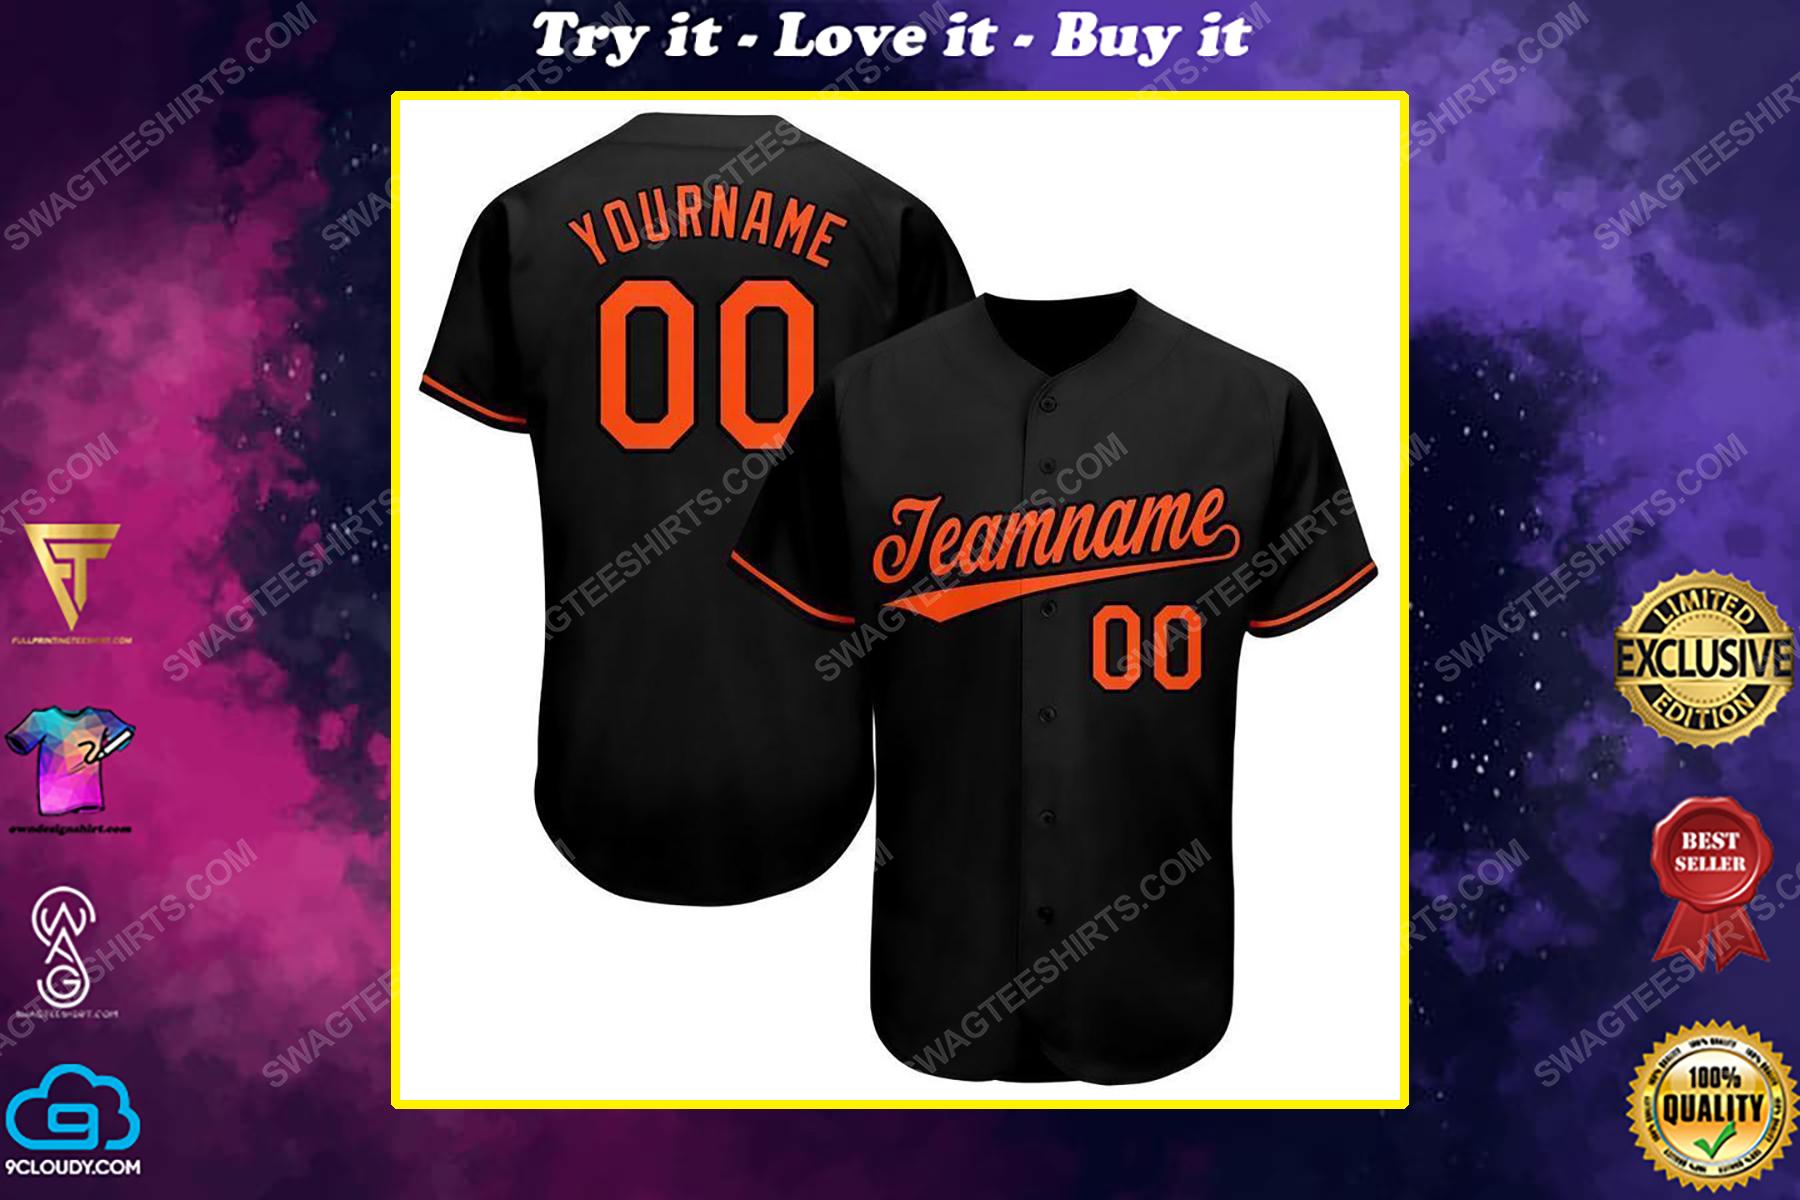 Custom team name baltimore orioles full printed baseball jersey